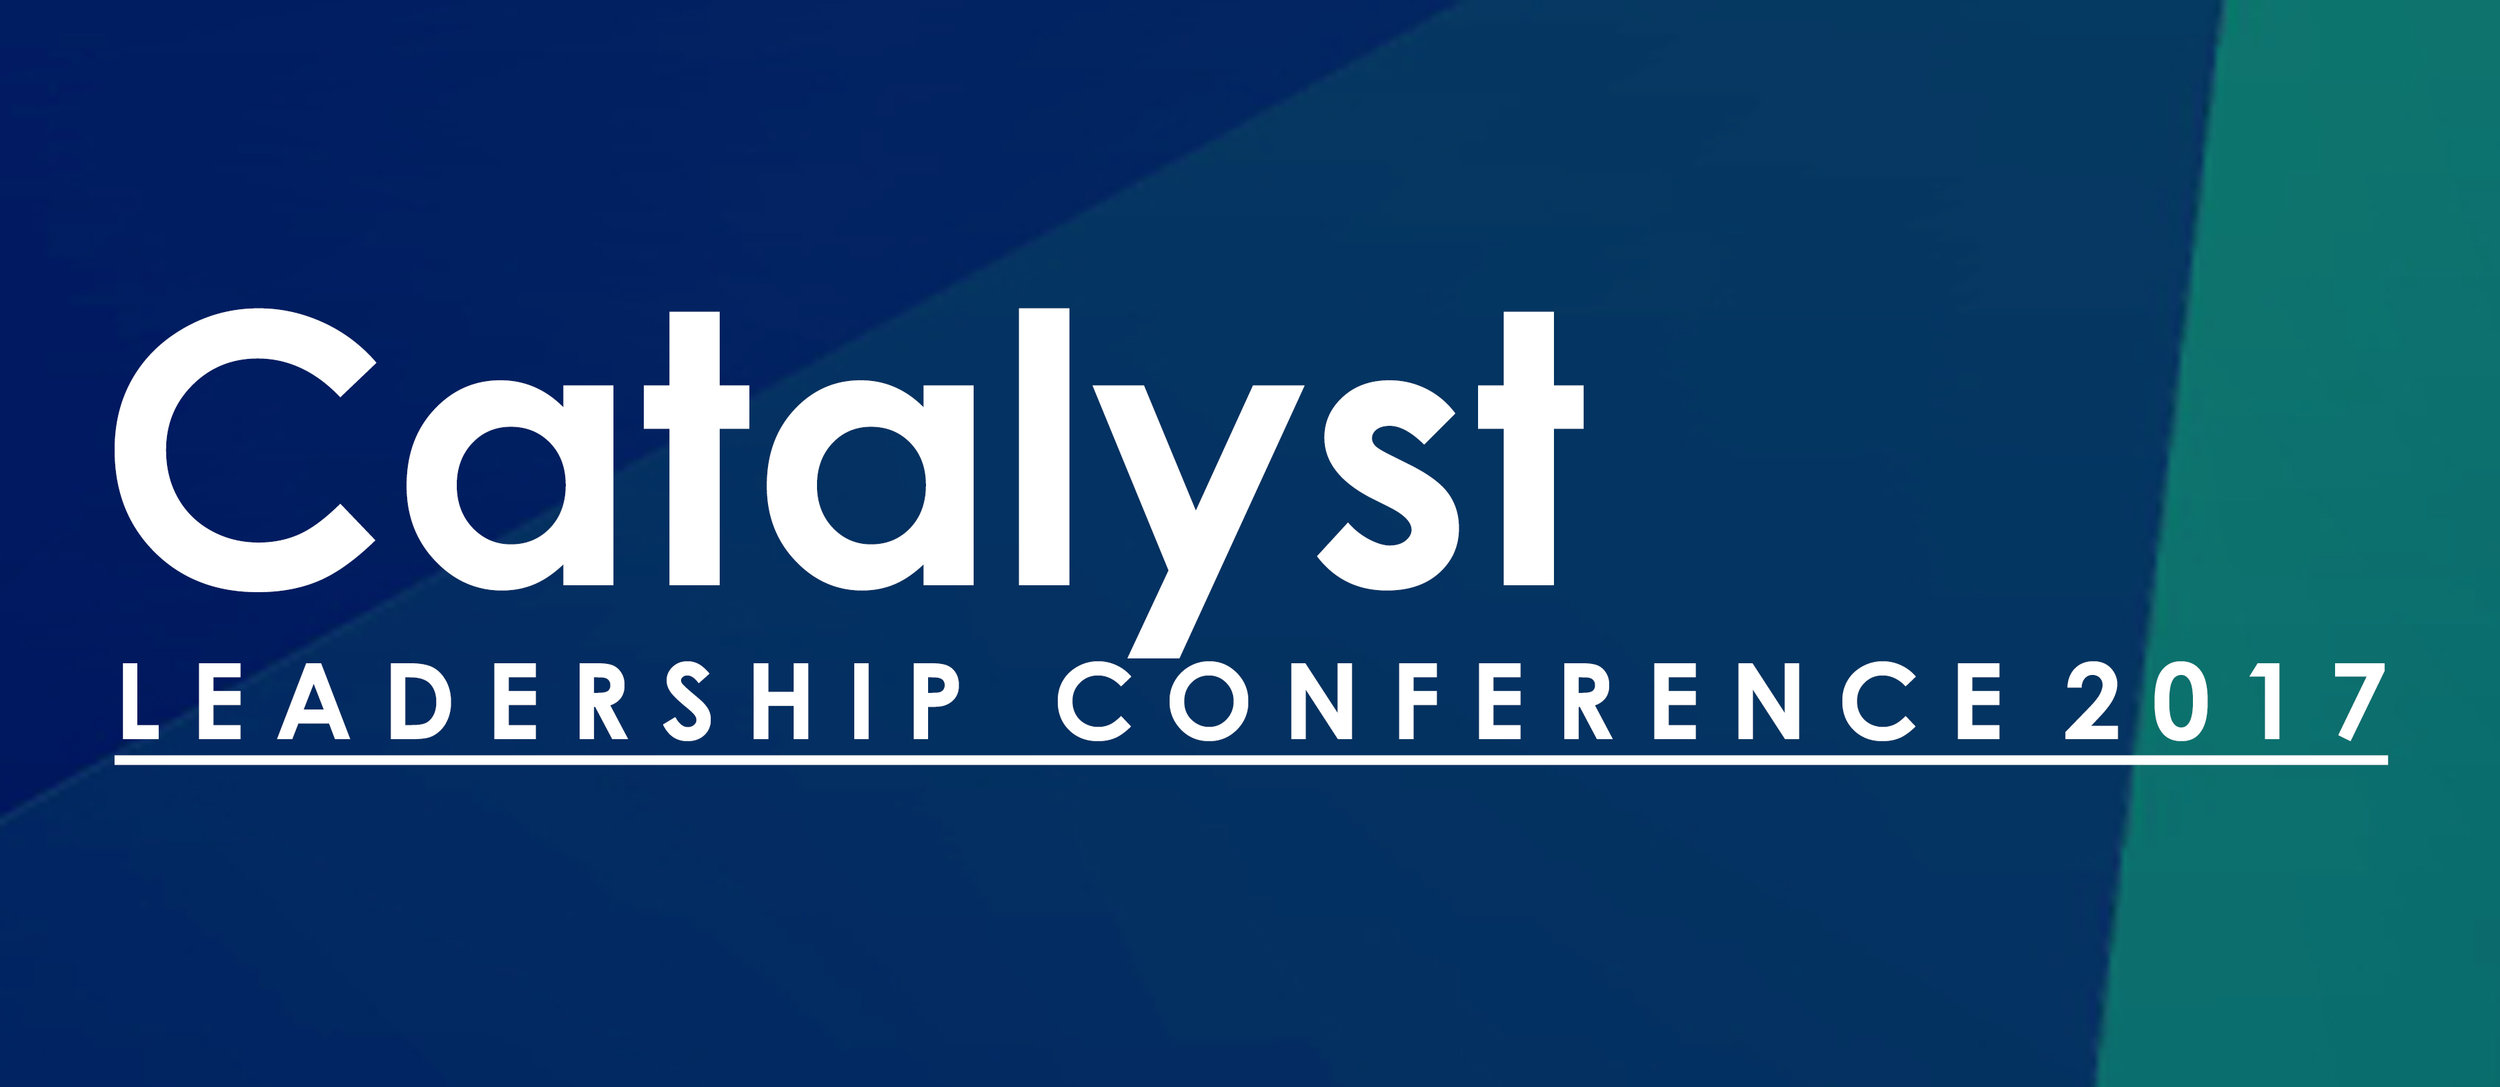 Catalyst-leadership 2017 banner.jpg